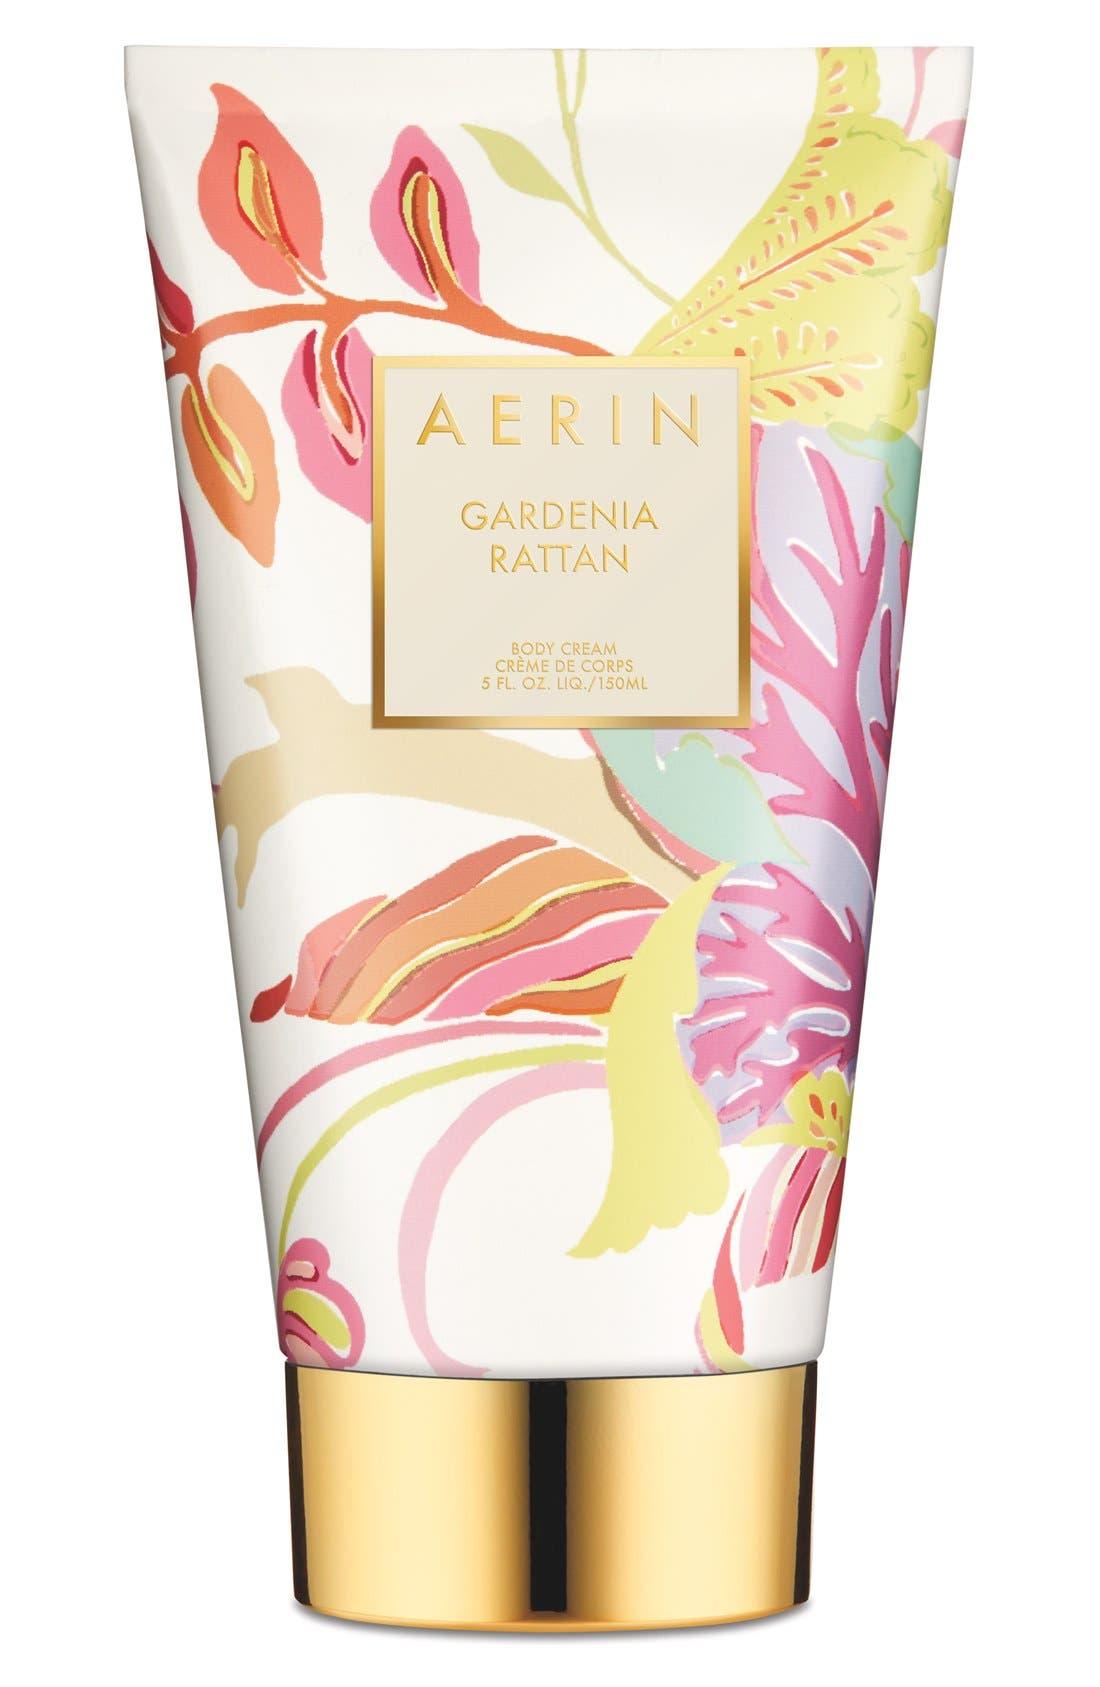 AERIN Beauty Gardenia Rattan Body Cream,                             Main thumbnail 1, color,                             000